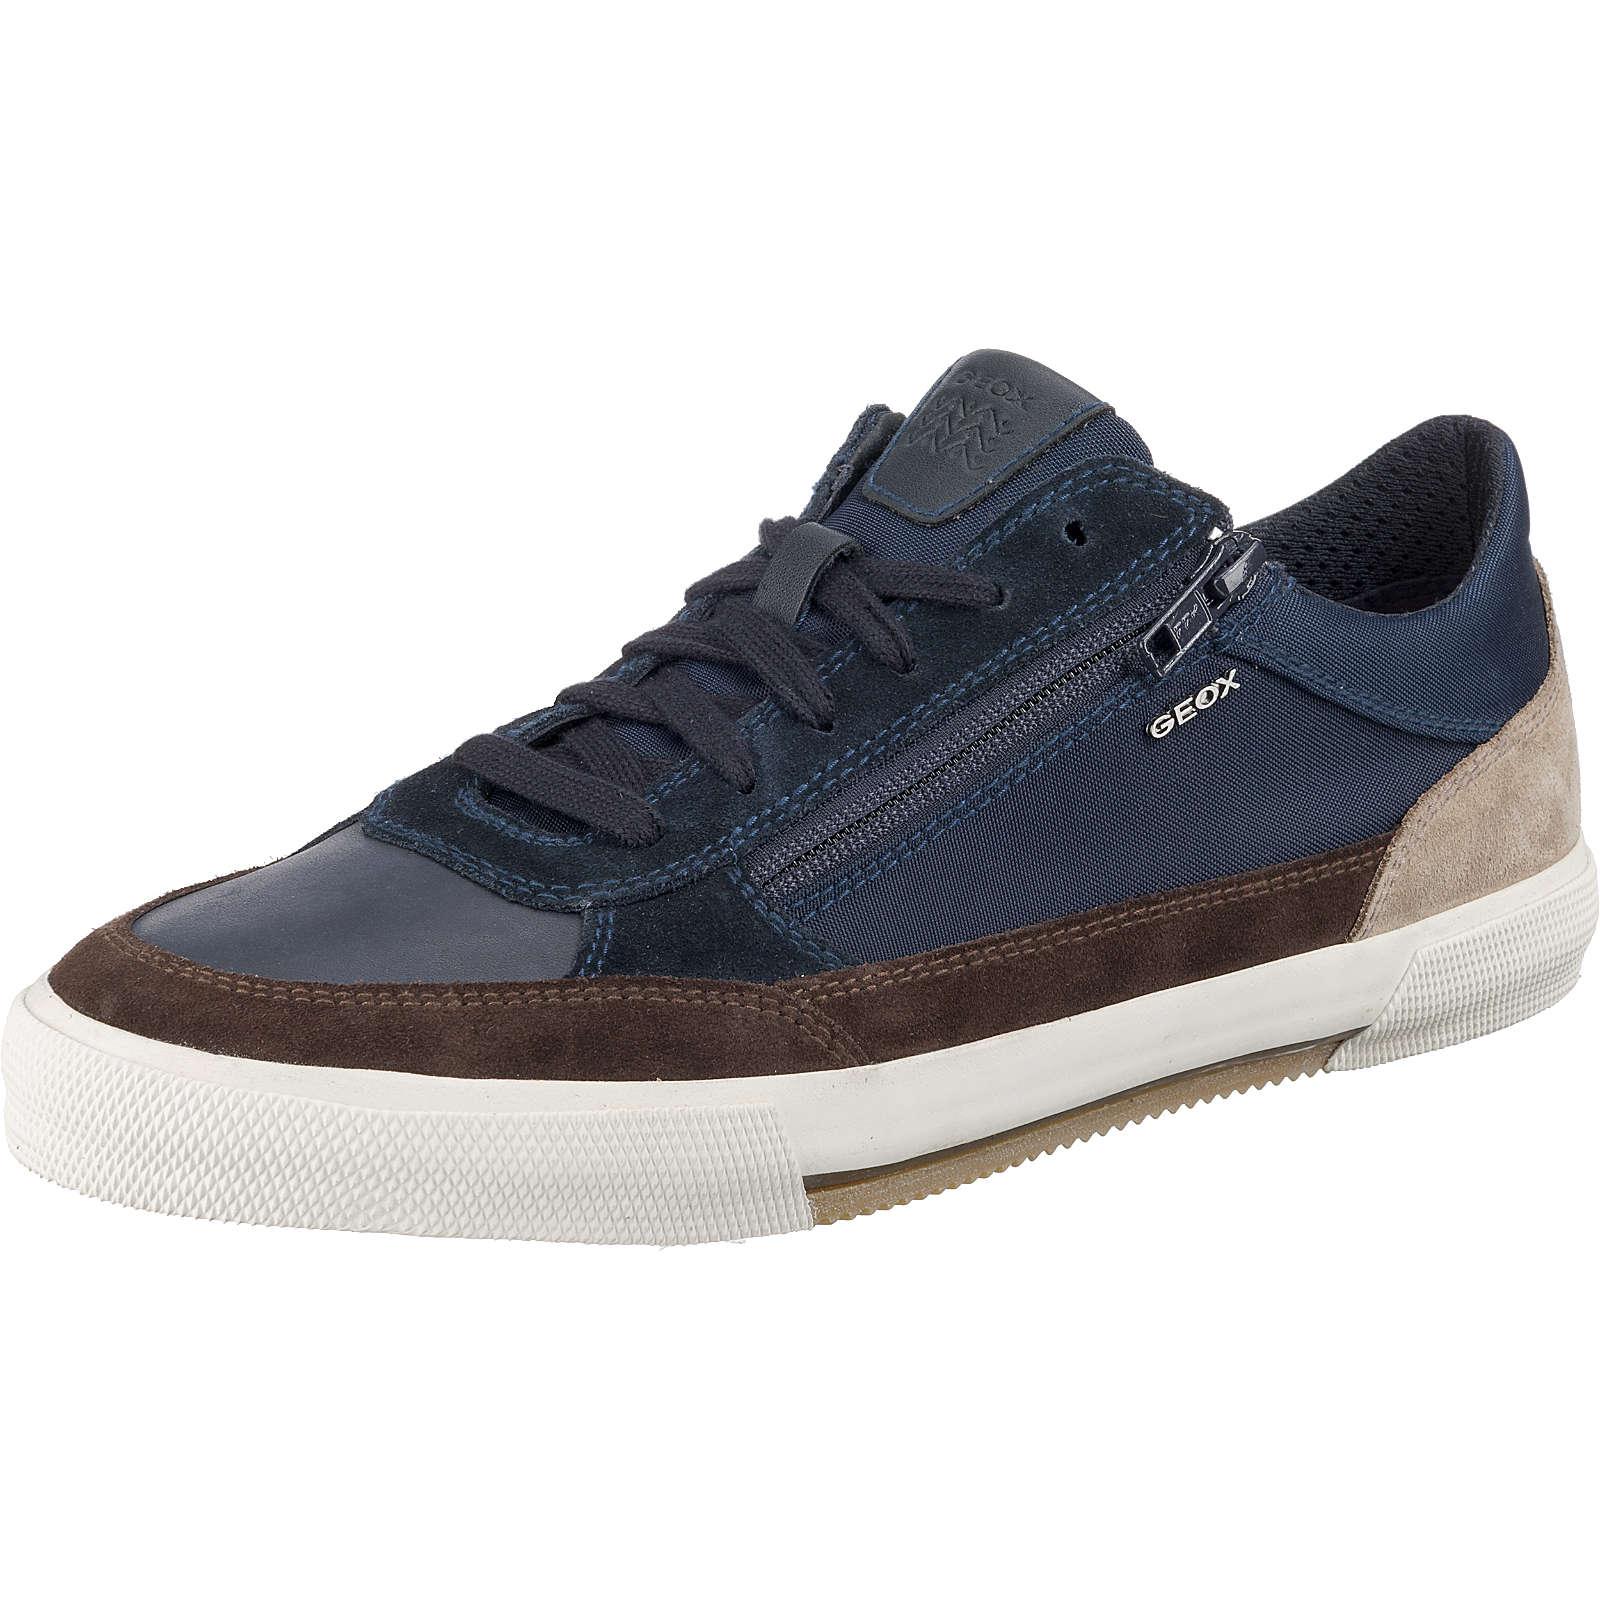 GEOX Sneakers Low blau/braun Herren Gr. 46